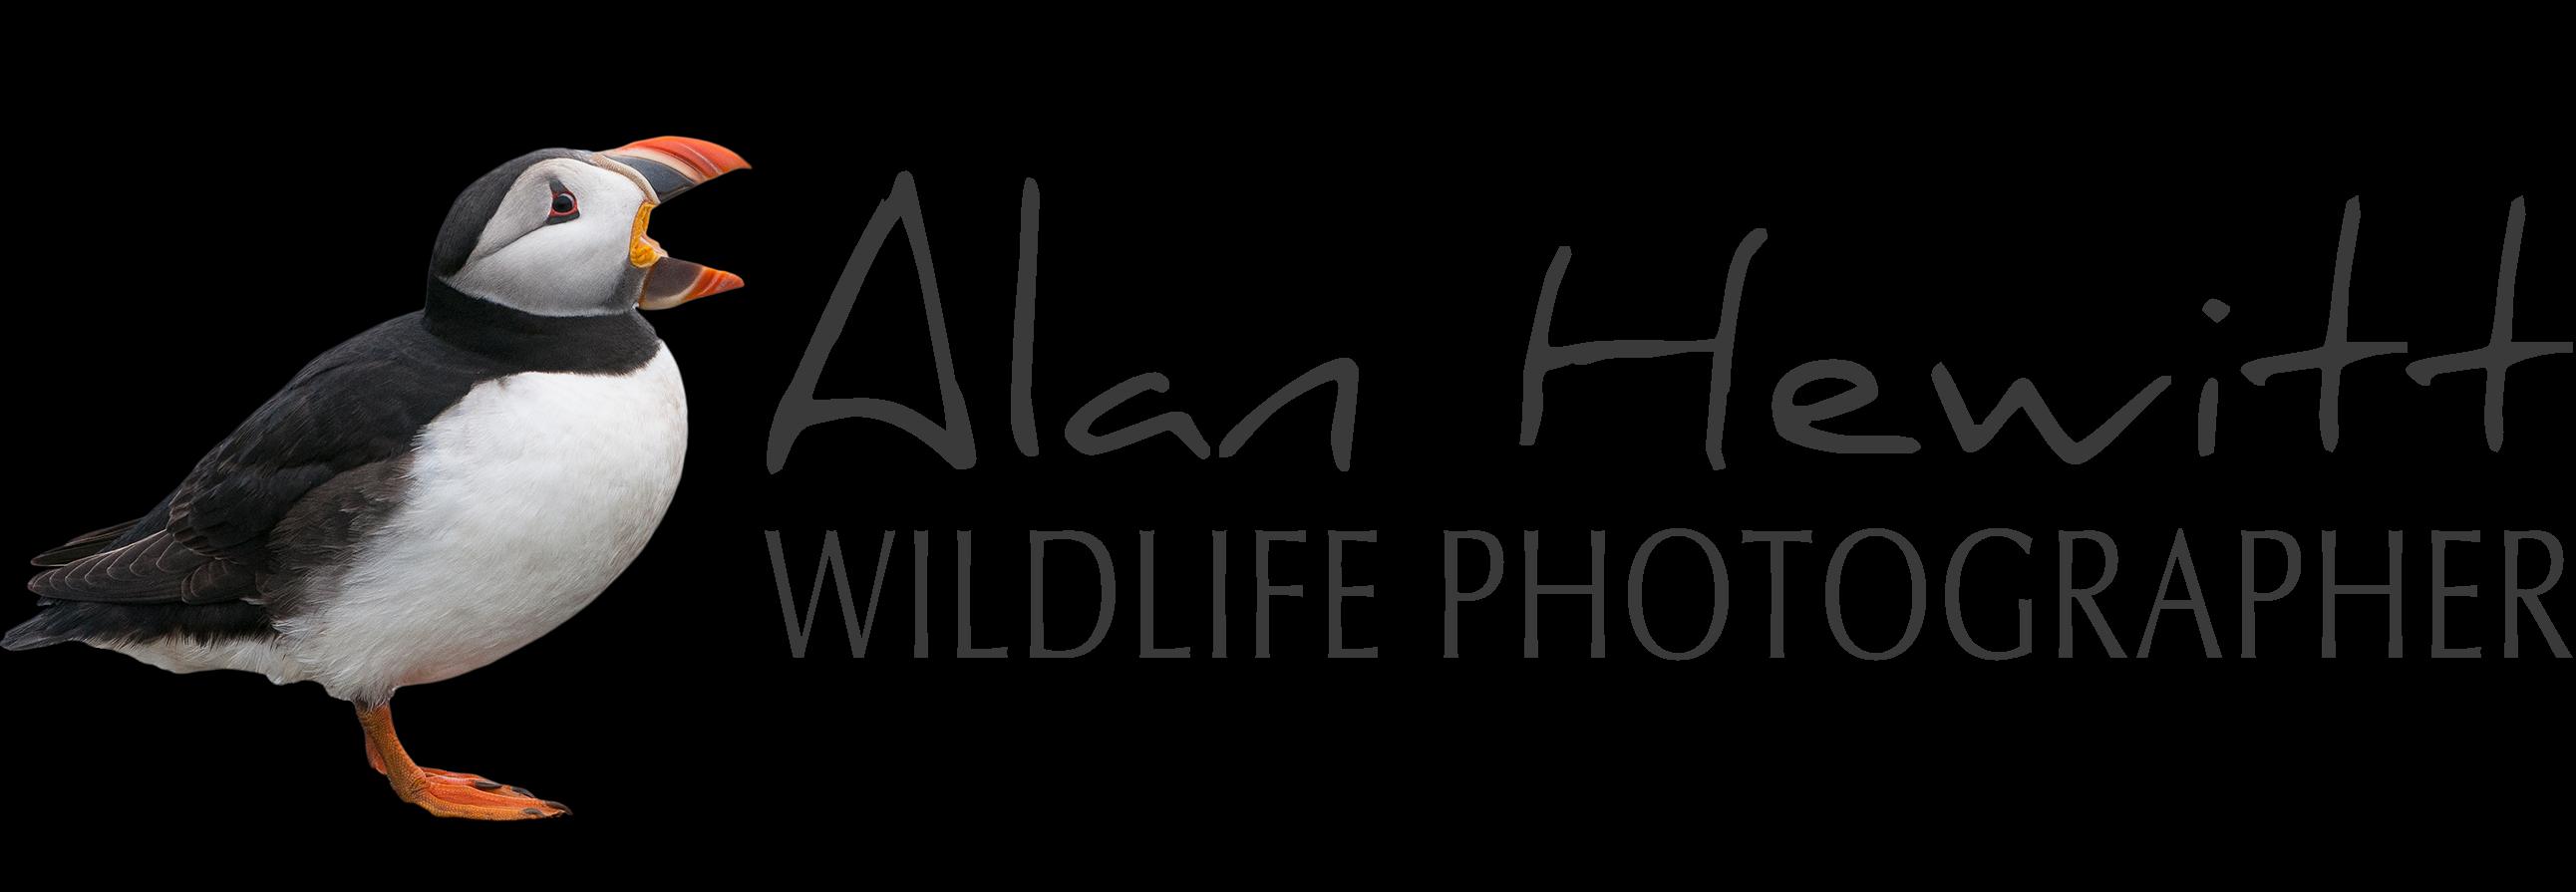 Alan Hewitt Photography